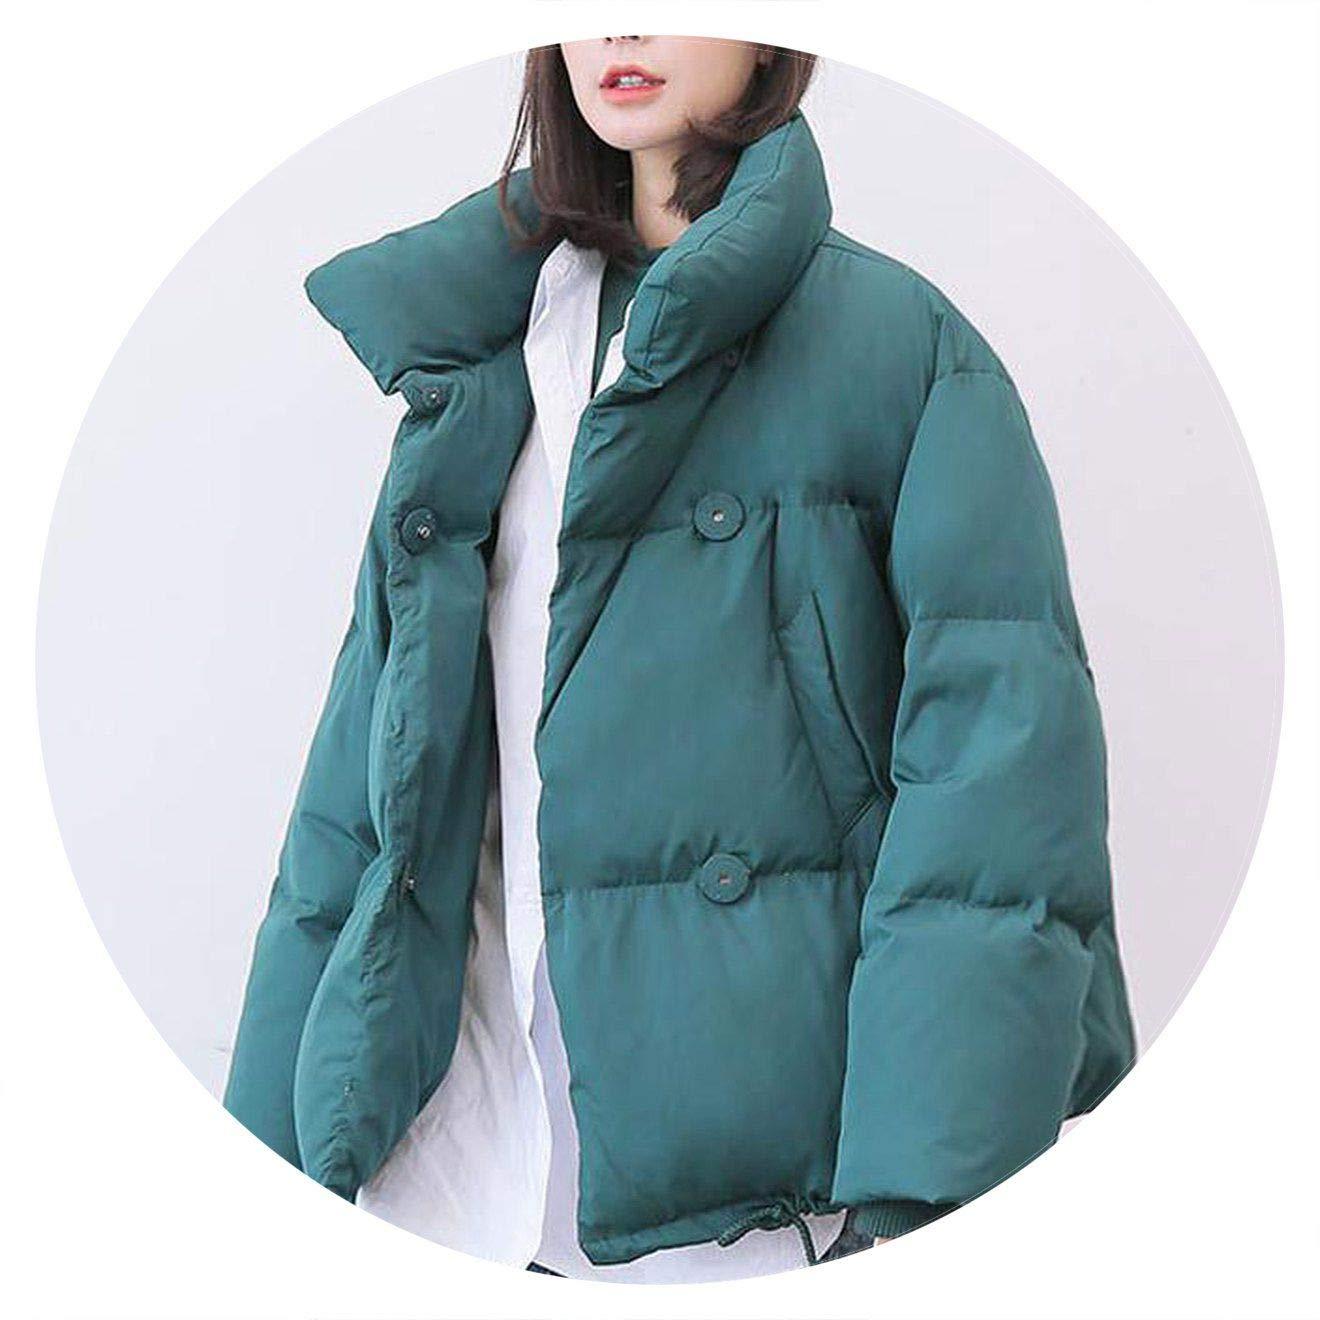 Green Jifnhtrs Winter Jacket Coats 90% Duck Down Parkas Loose Warm Snow Short Outwear Female Stand Collar Overcoat